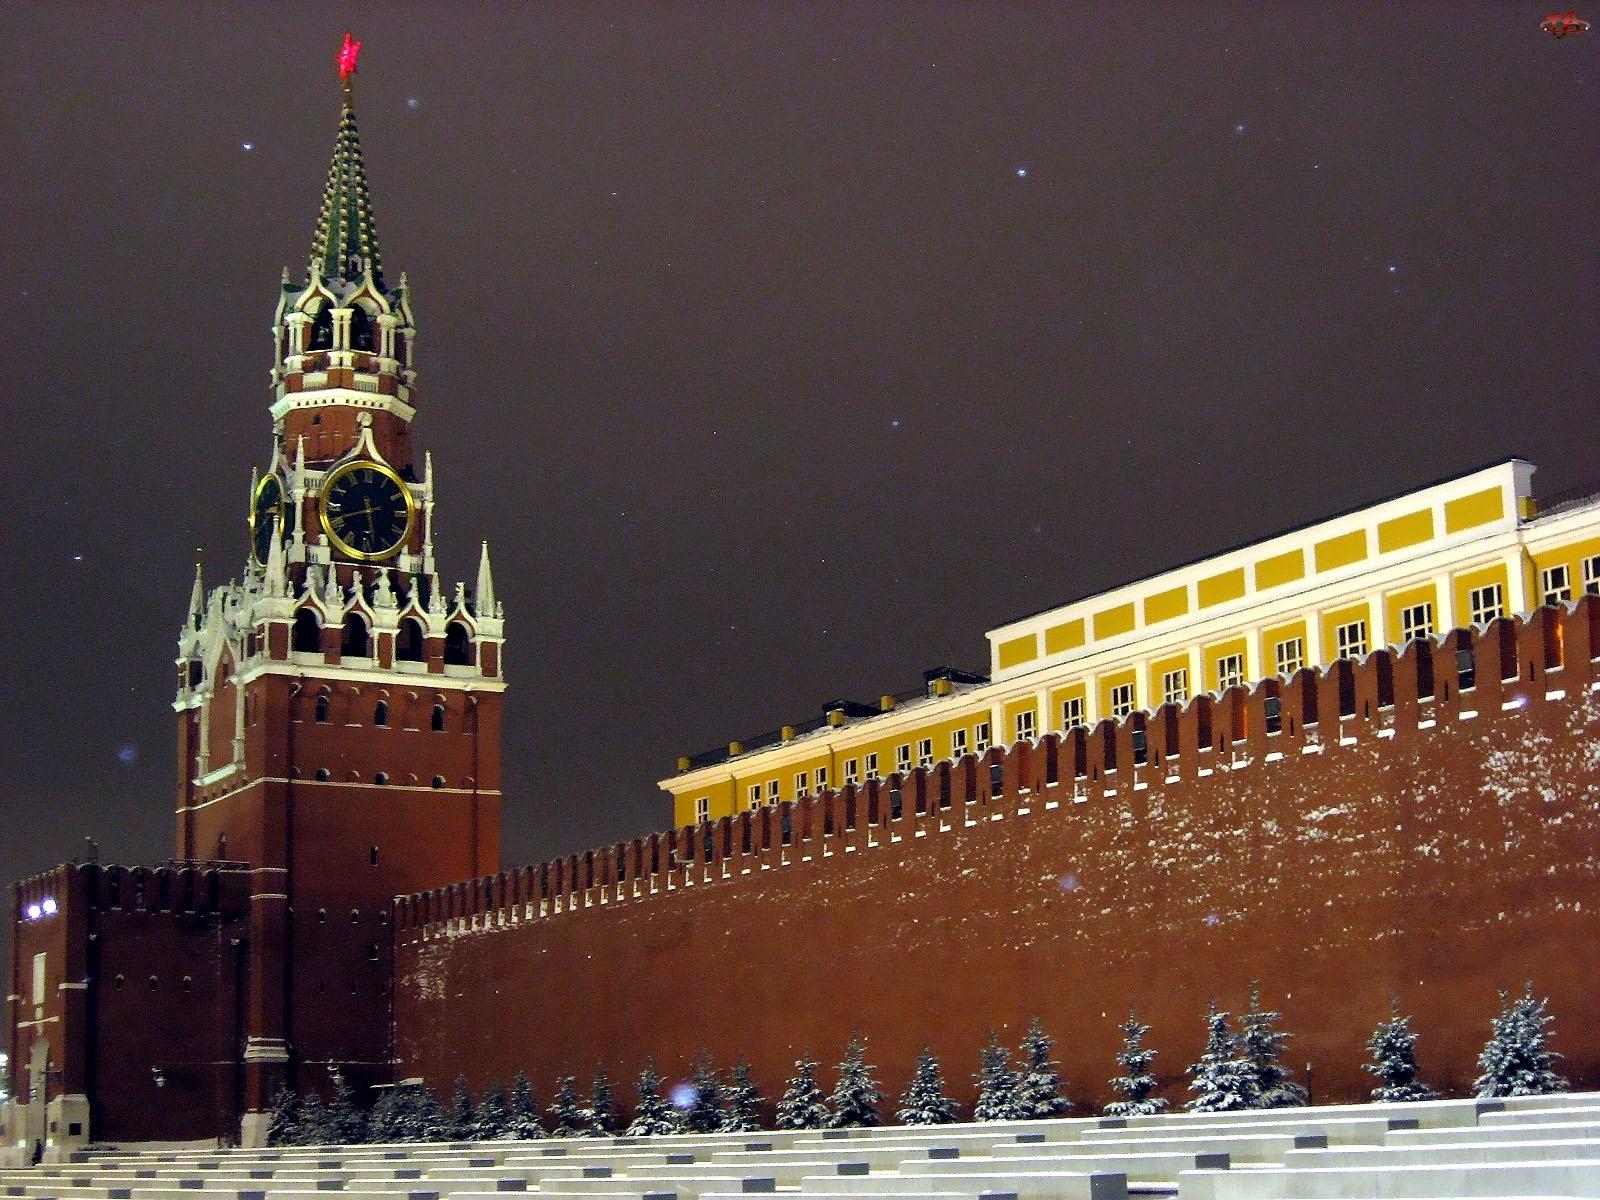 Spasska, Rosja, Kreml, Moskwa, Wieża